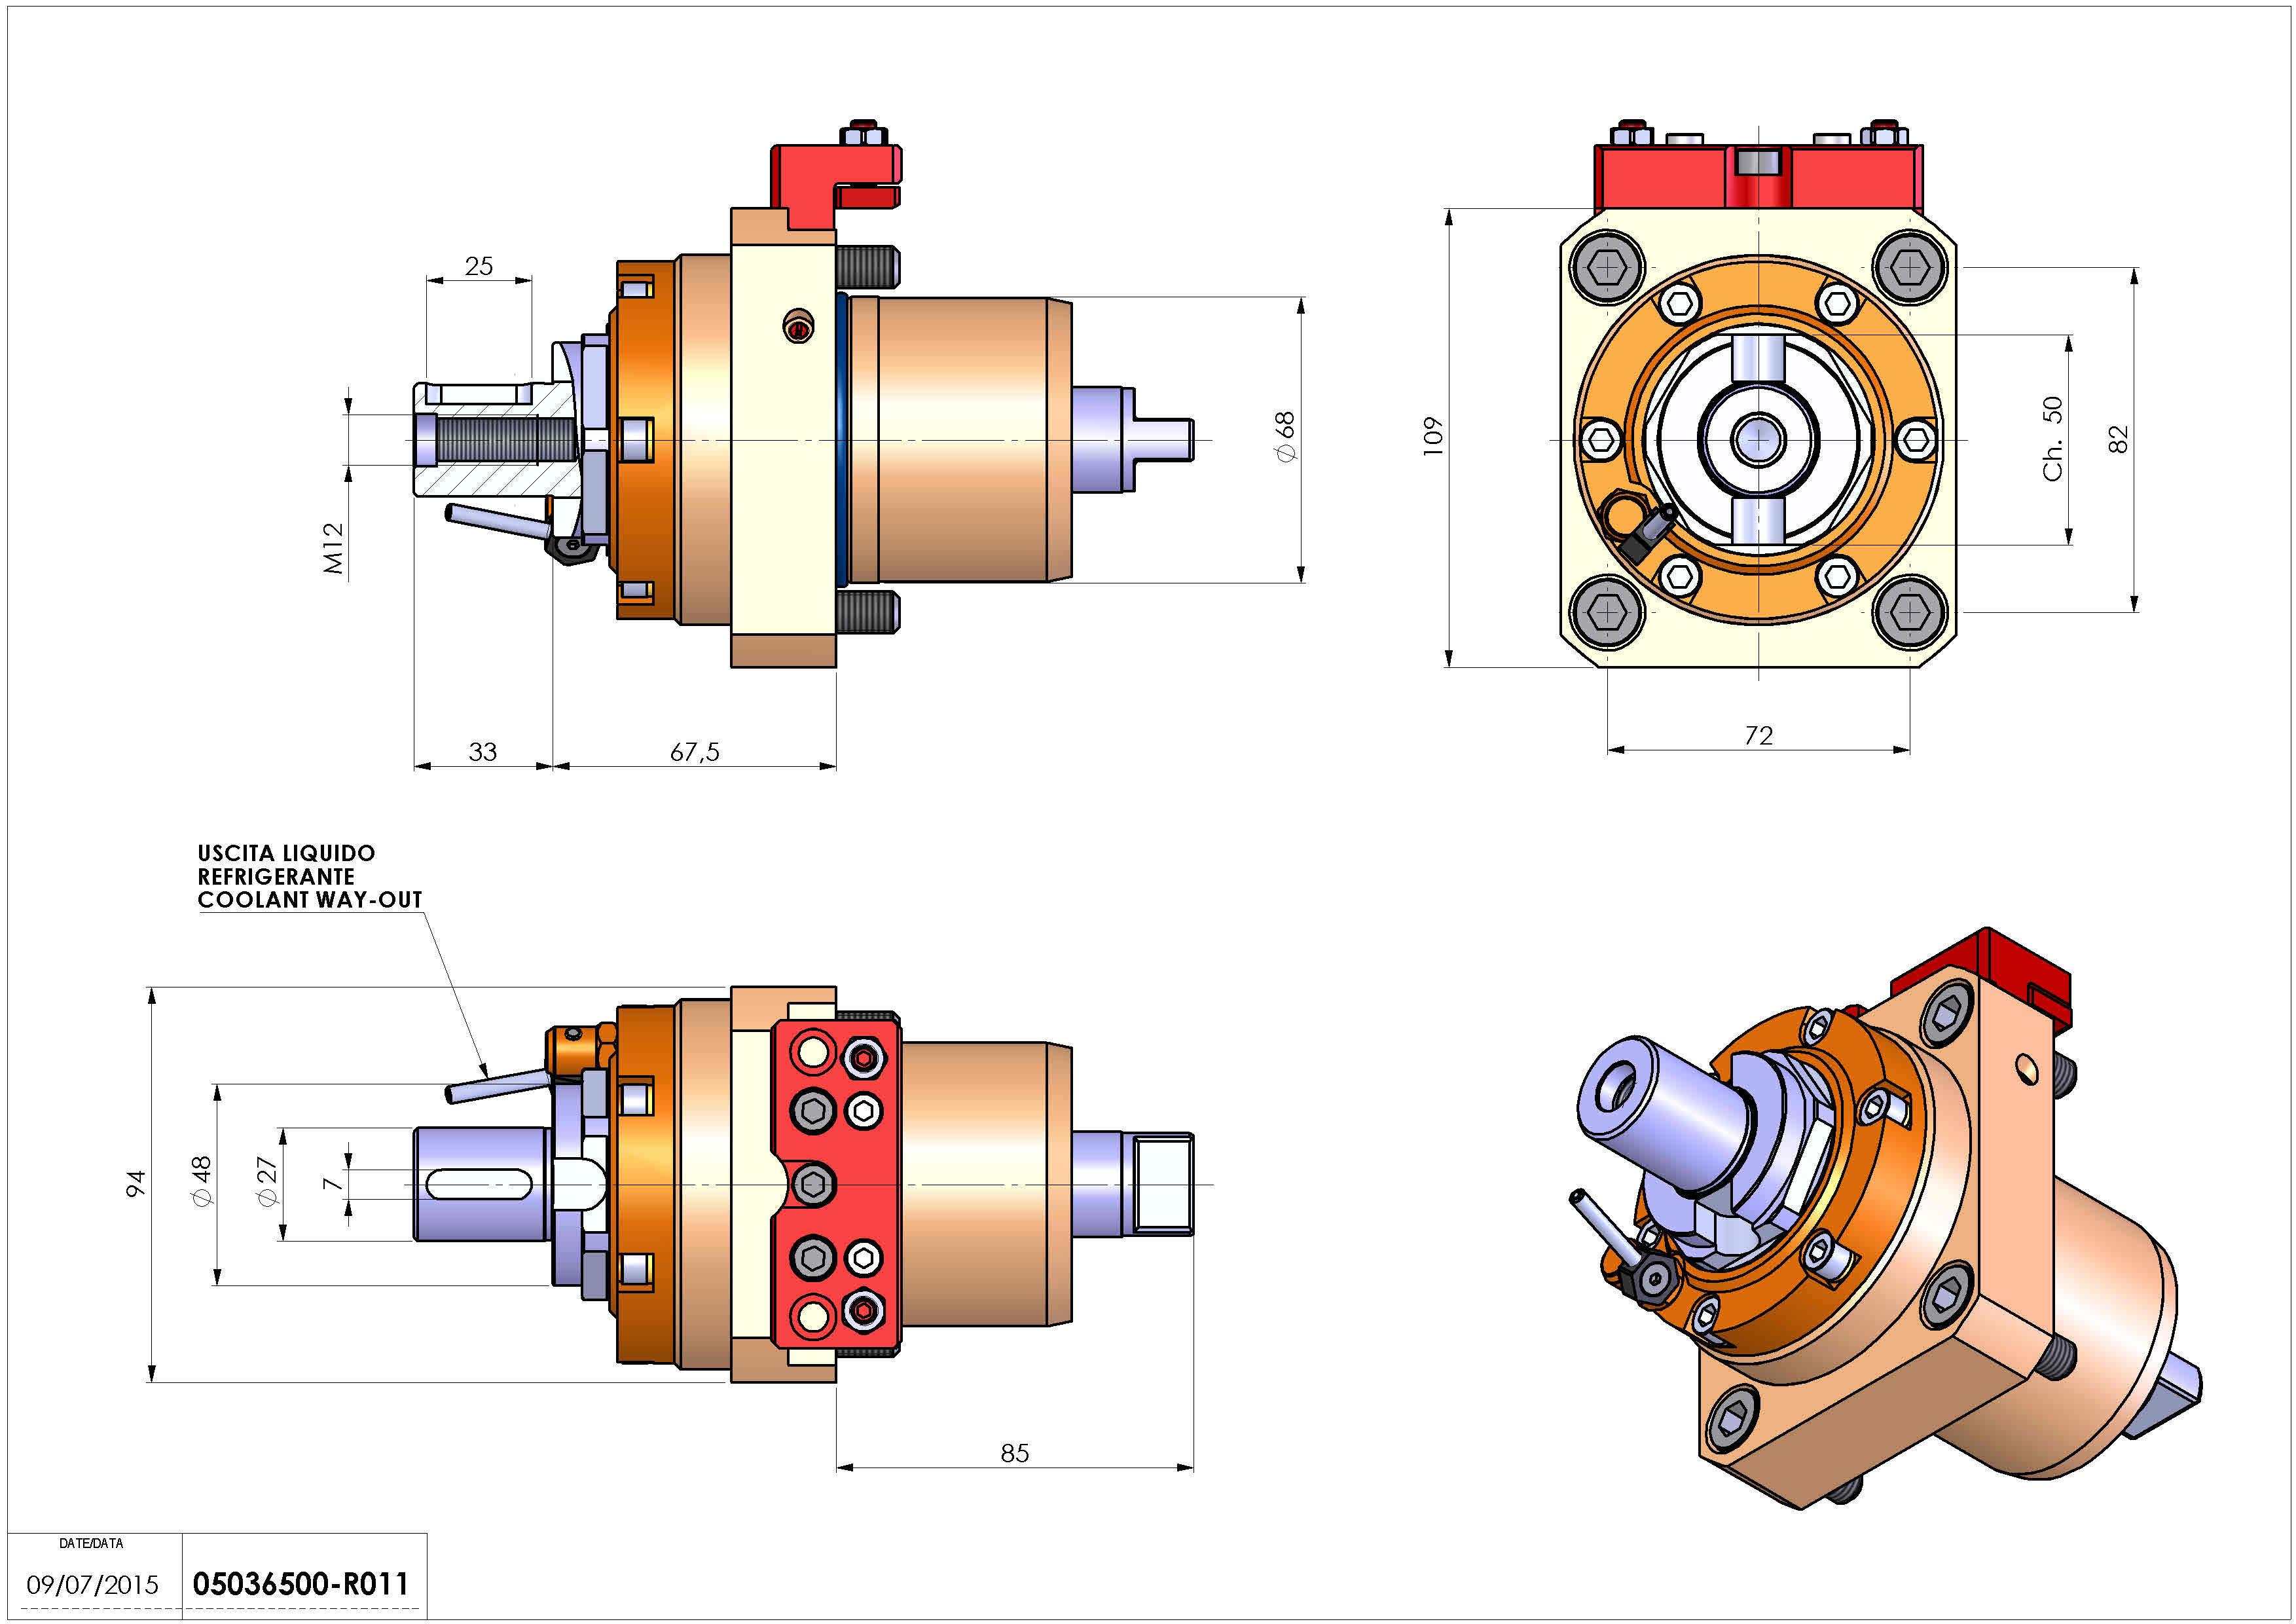 Technical image - LT-S D68 DIN138-27 H68 TWJ.